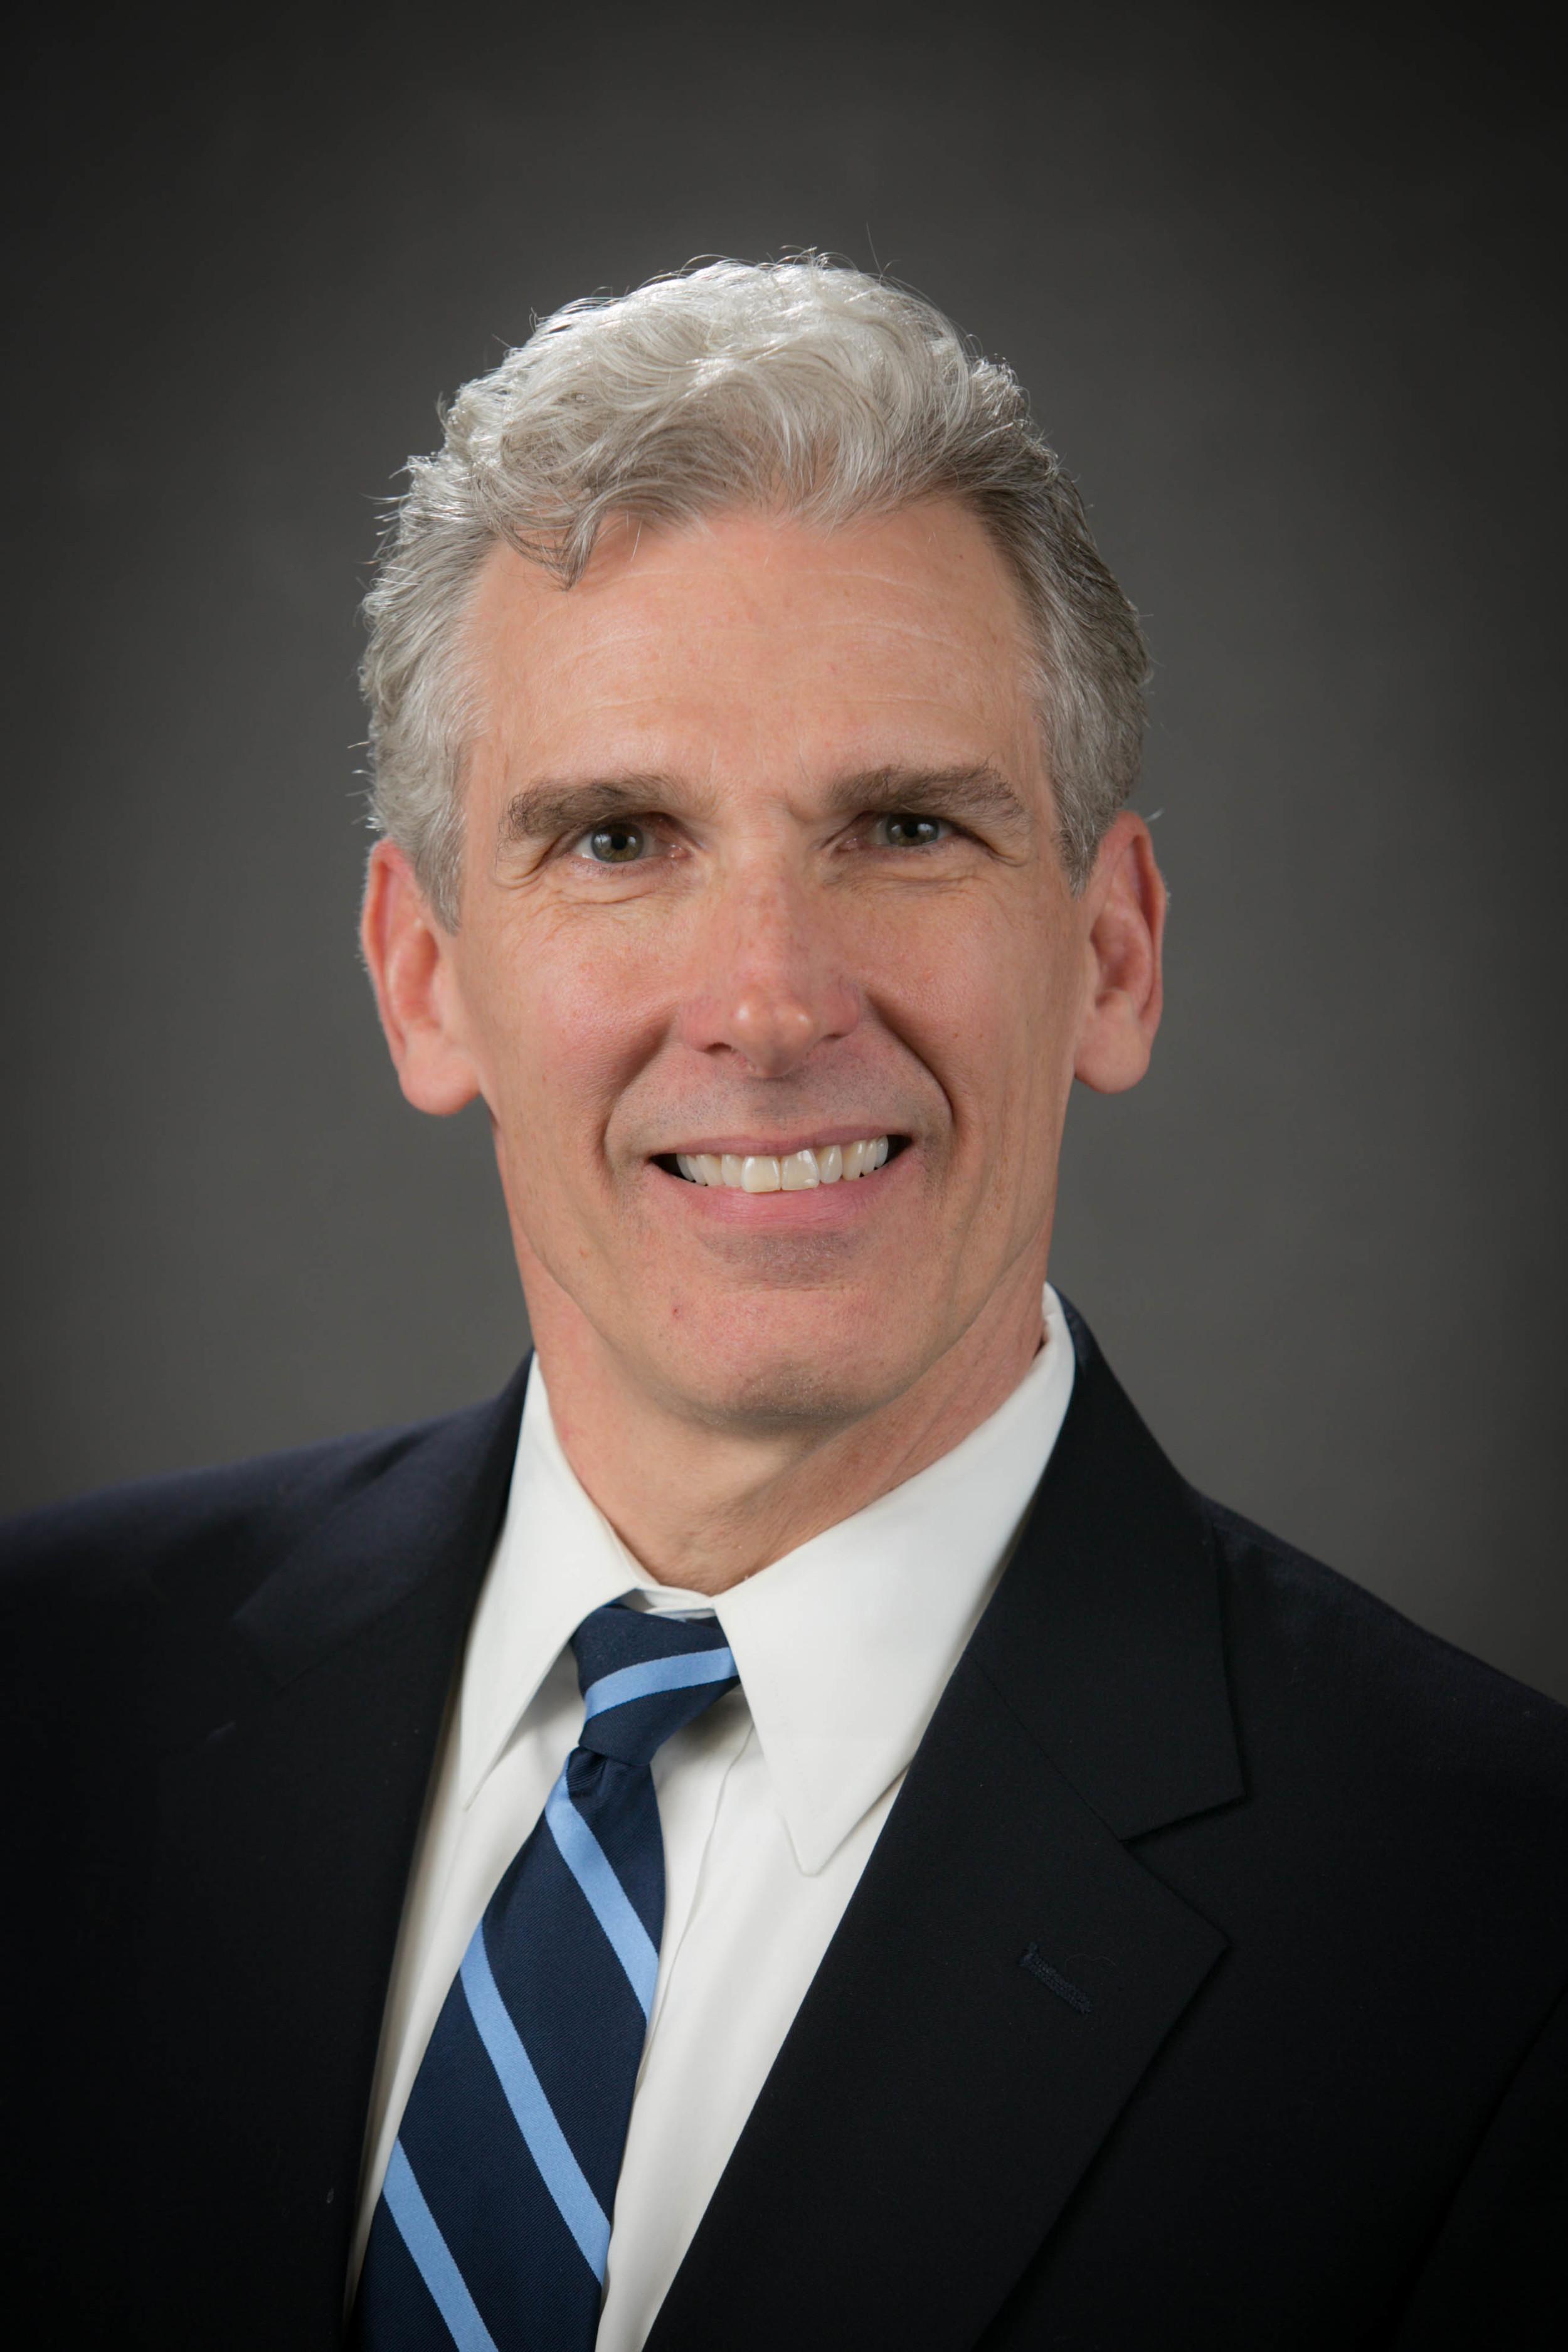 Dr. Richard Butz